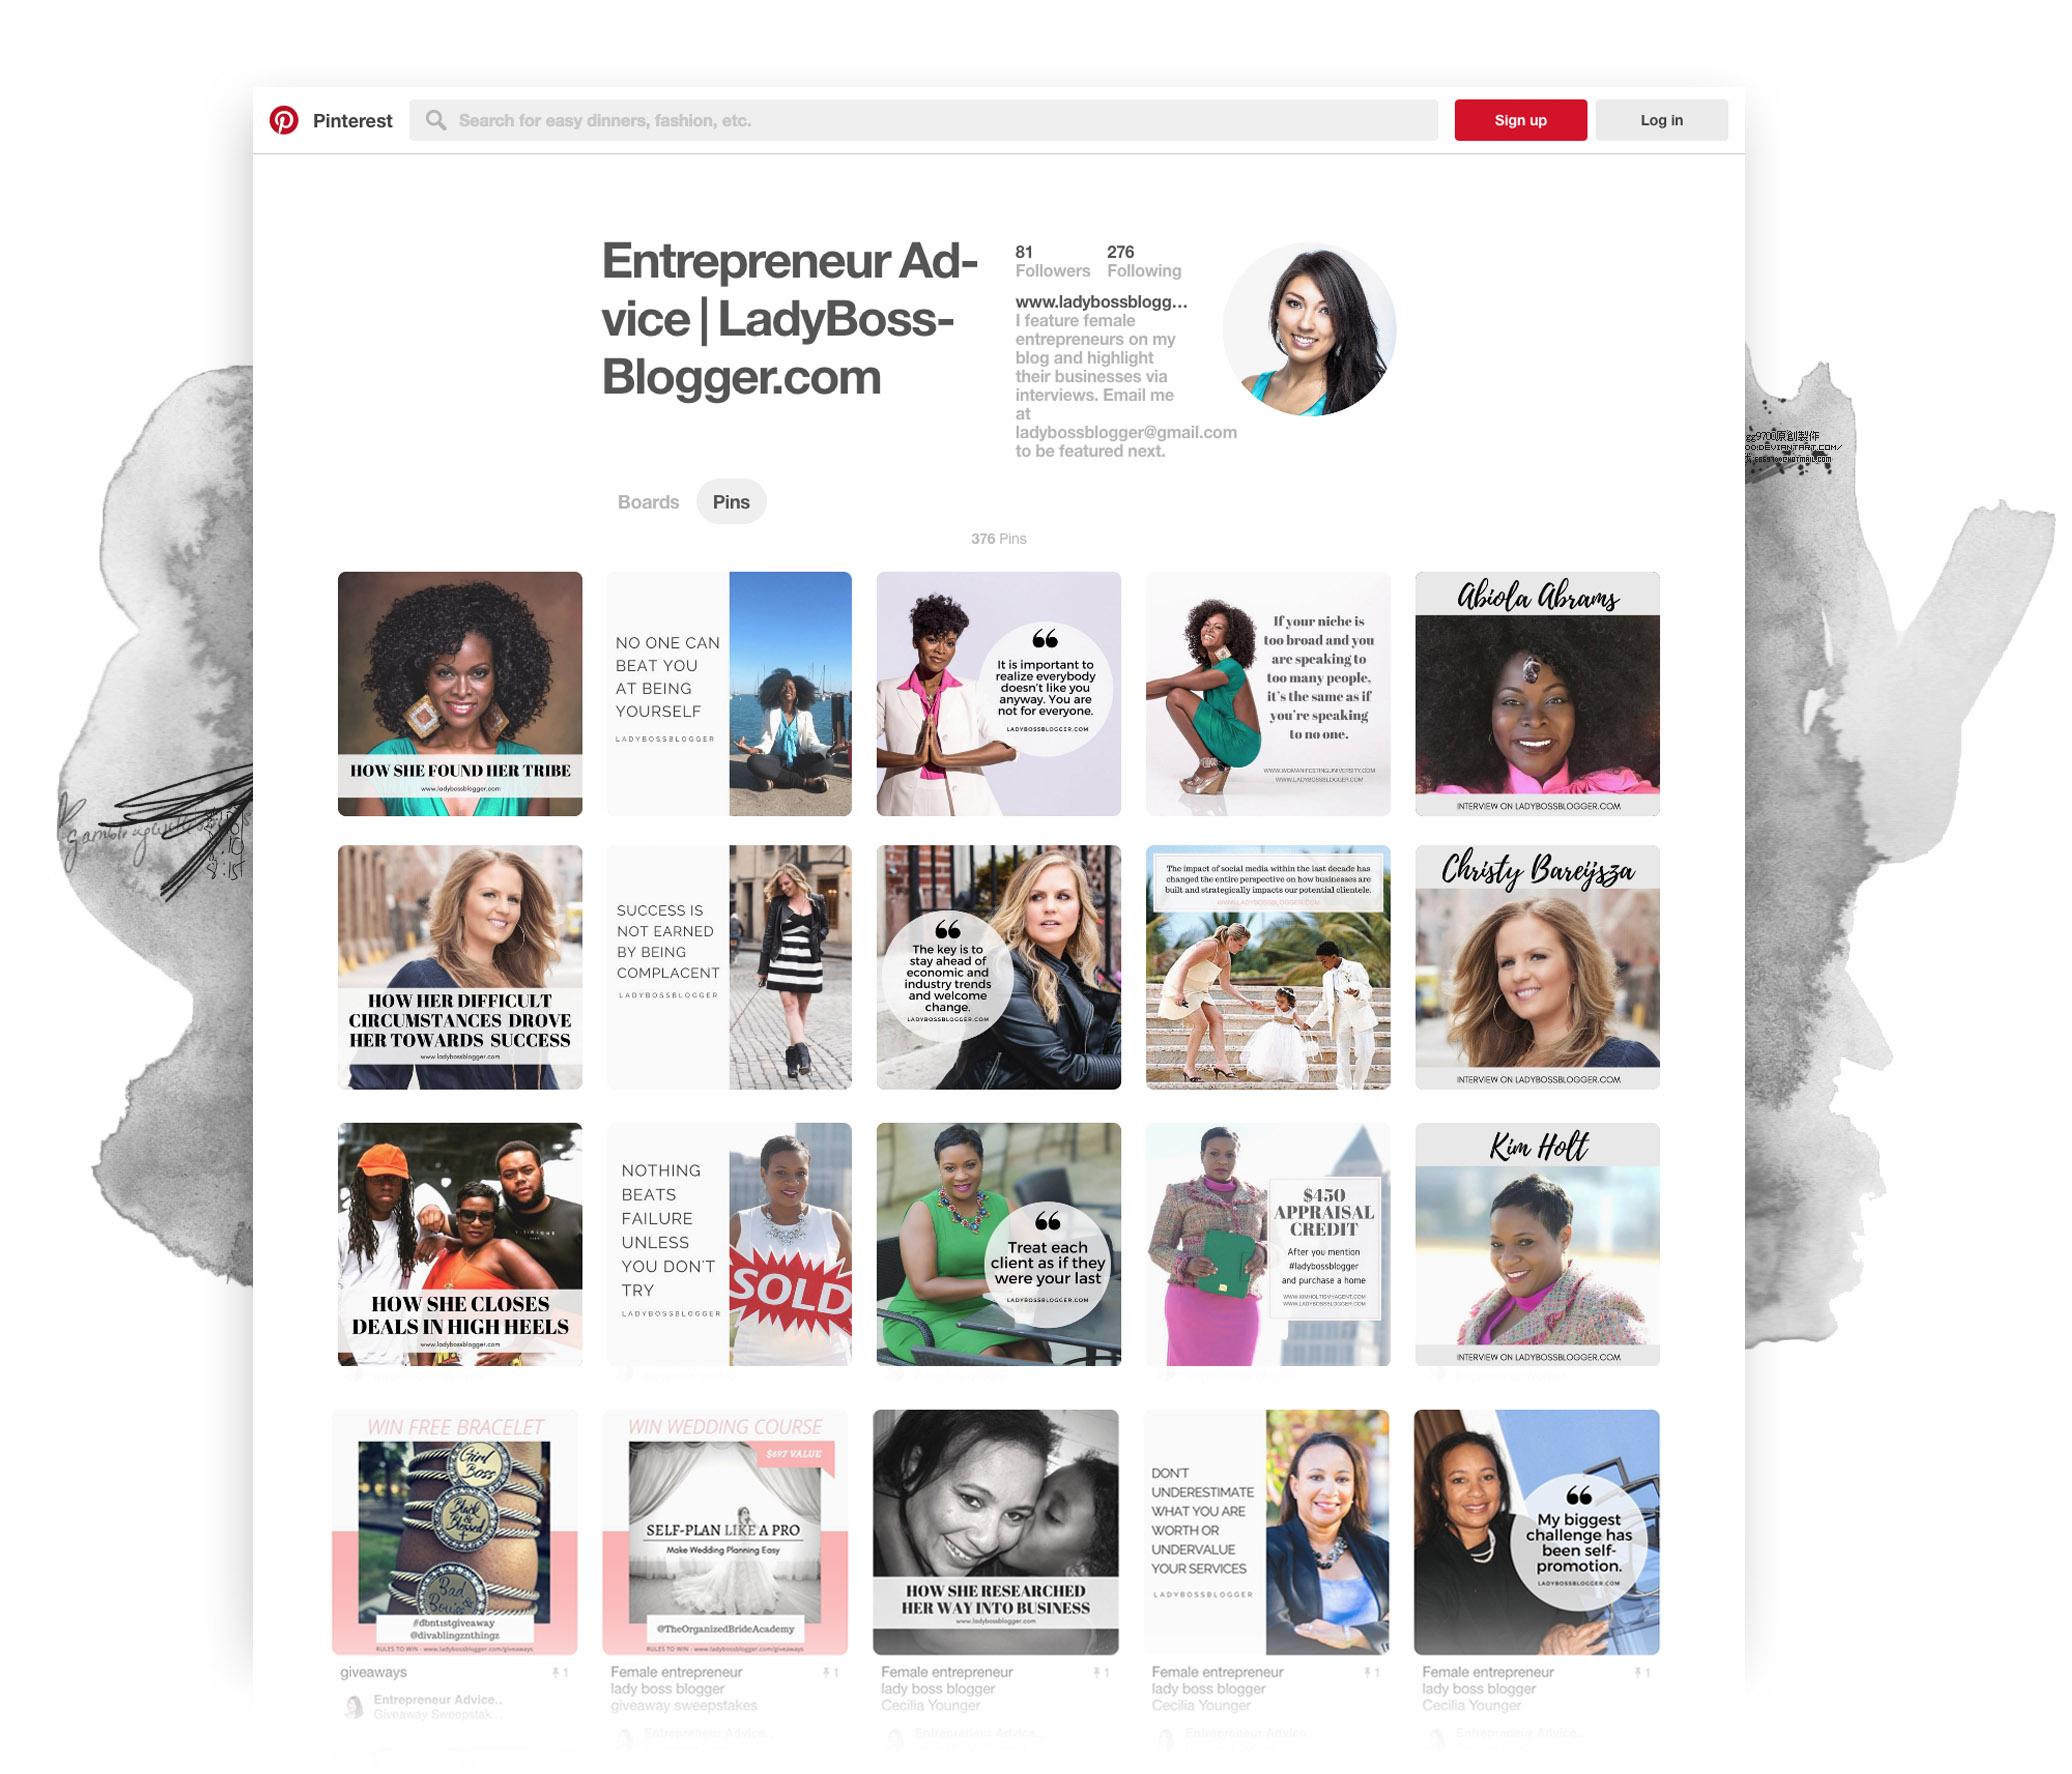 LadyBossBlogger Pinterest page strategy